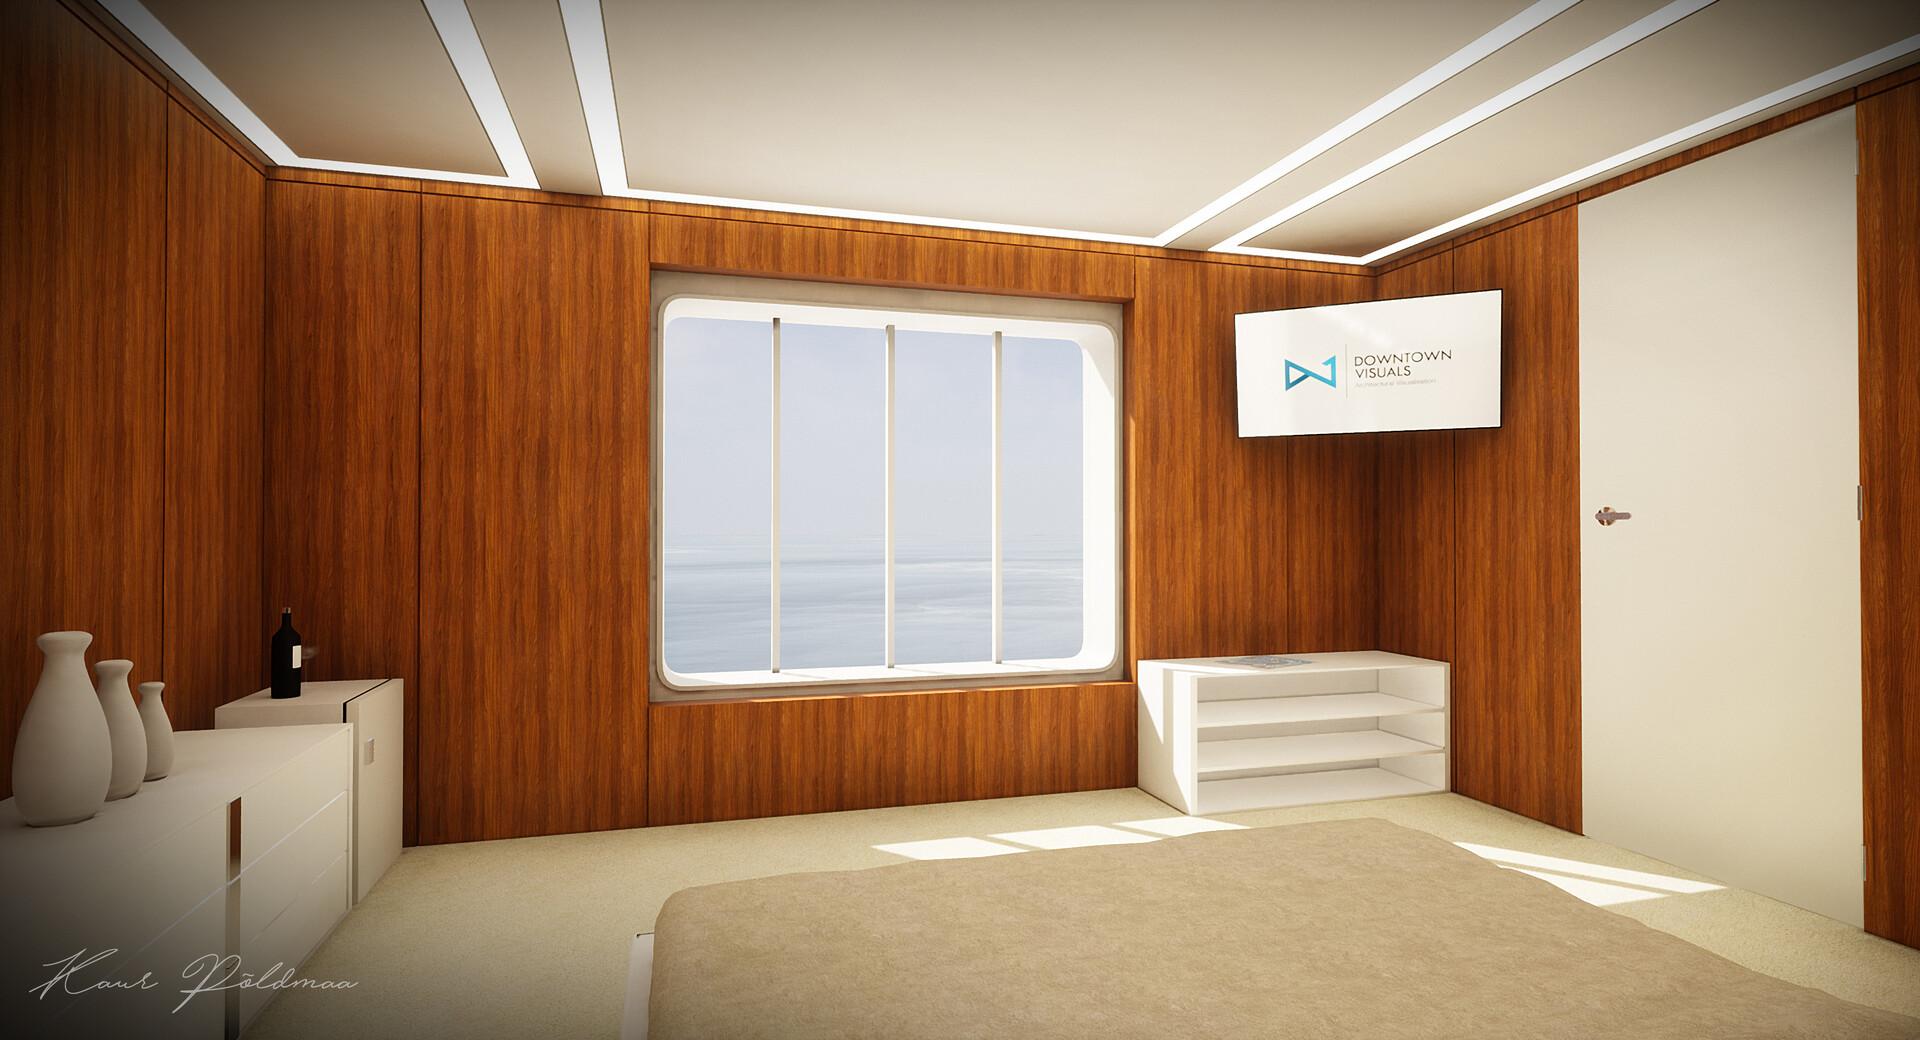 ArtStation - Yacht VR Demo - Unreal Engine 4 Archviz, Kaur